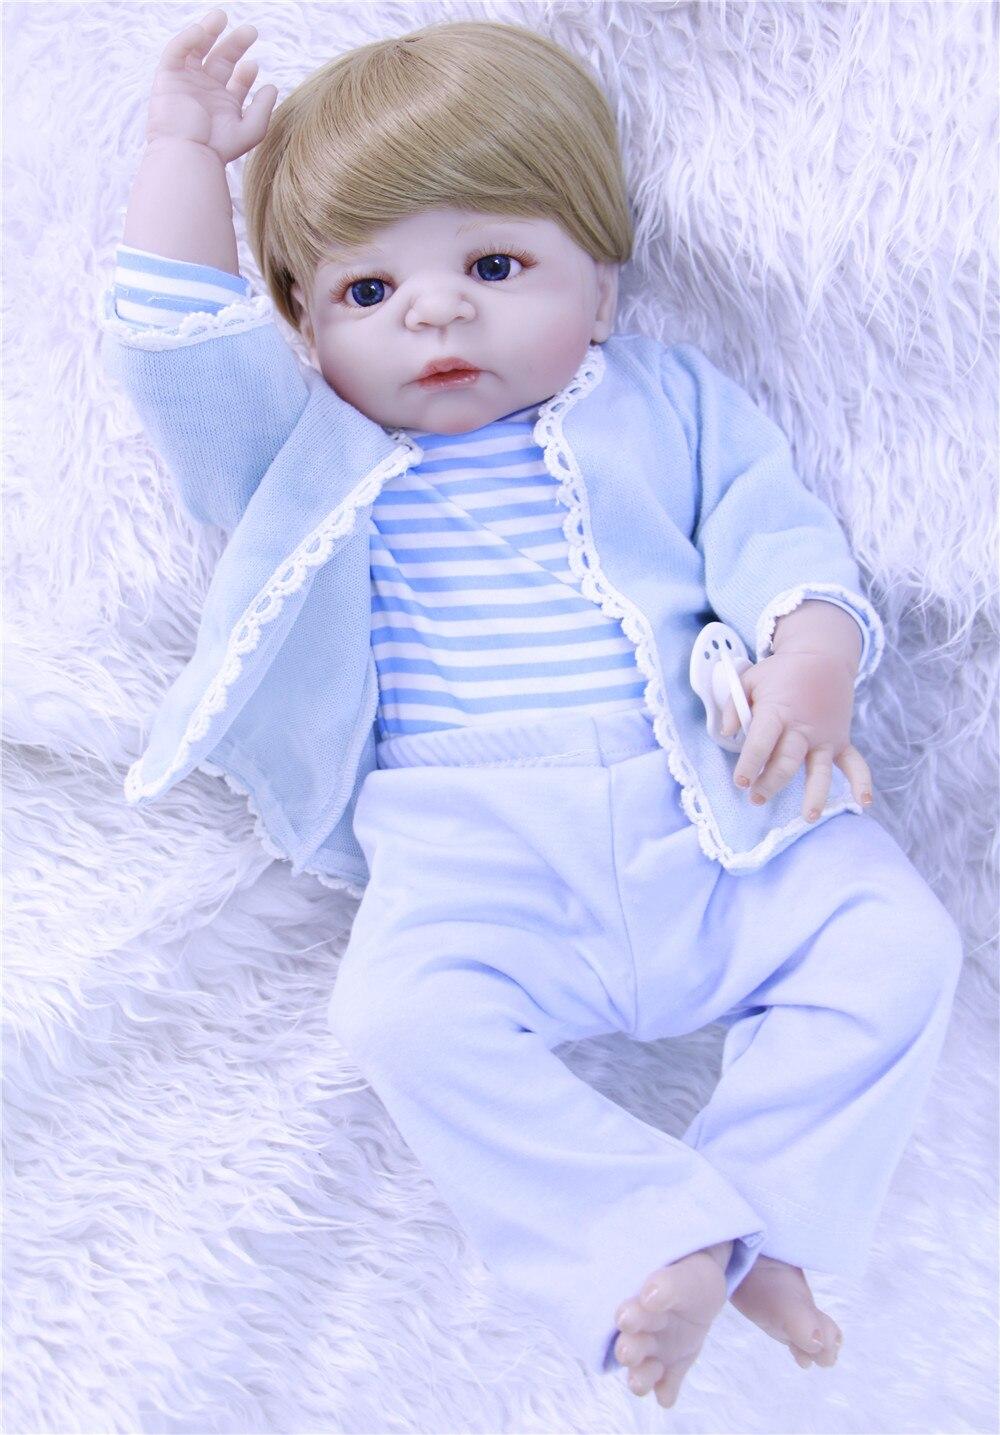 57cm big size bebes reborn doll Lifelike newborn Baby boy Bonecas kid toy full silicone reborn baby dolls Interactive toy gift